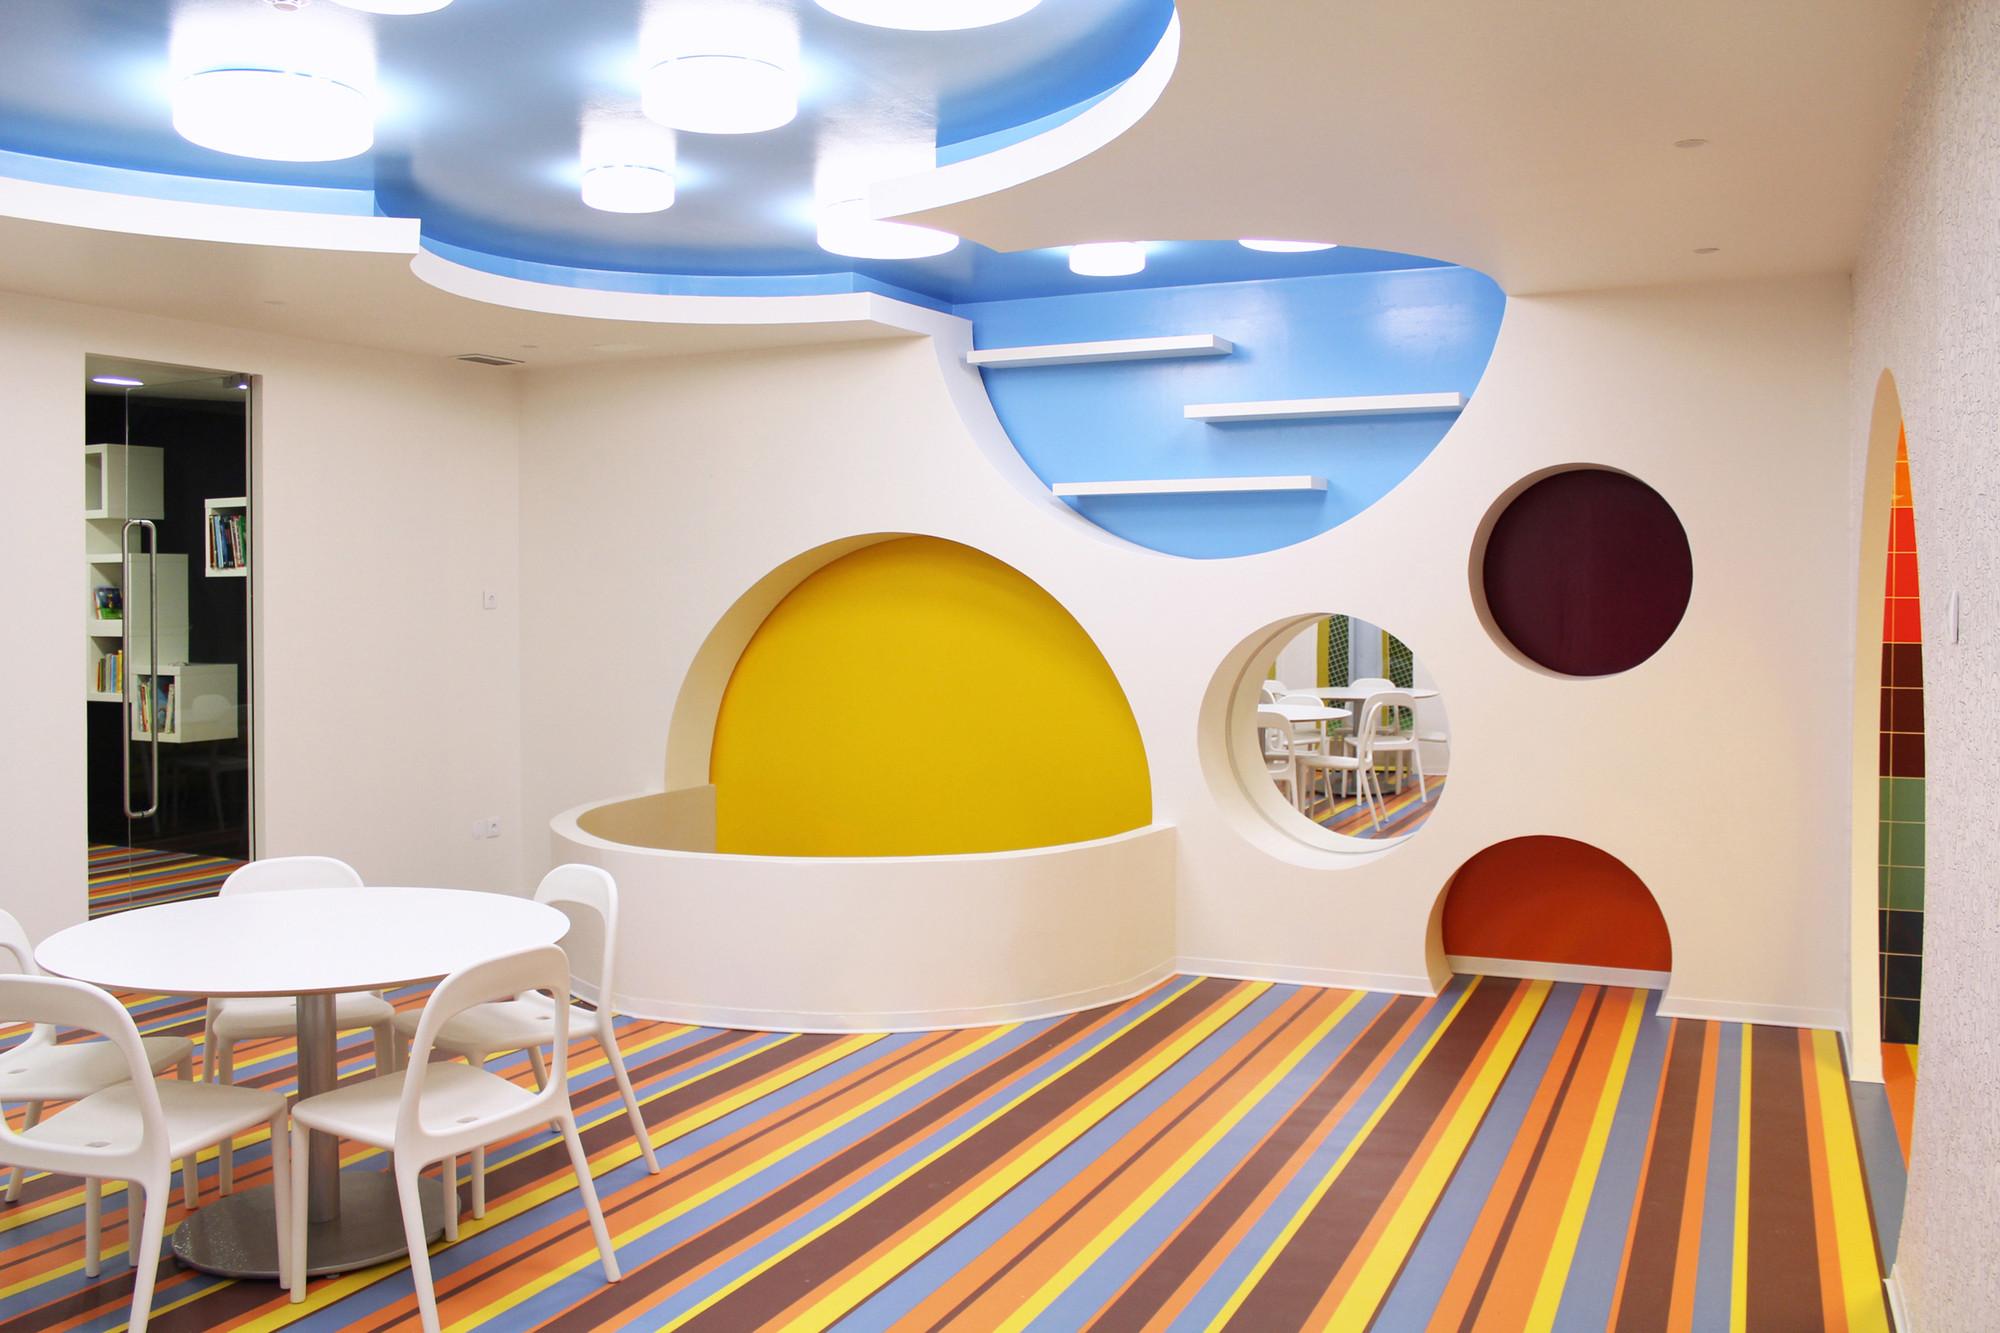 Kalorias - Children's Space / estúdio AMATAM, Courtesy of estúdio AMATAM